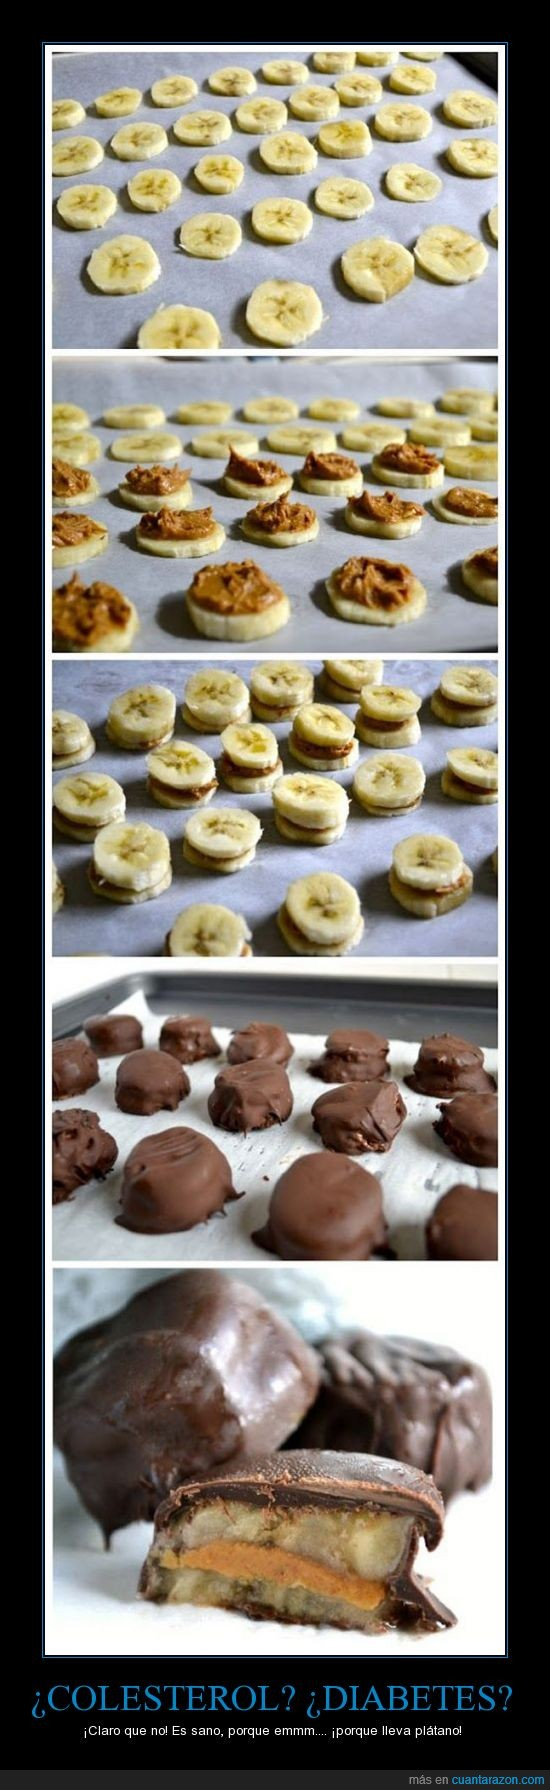 banana,bombones,chocolate,colesterol,diabetes,dulce,ñam ñam ñam ñam,platano